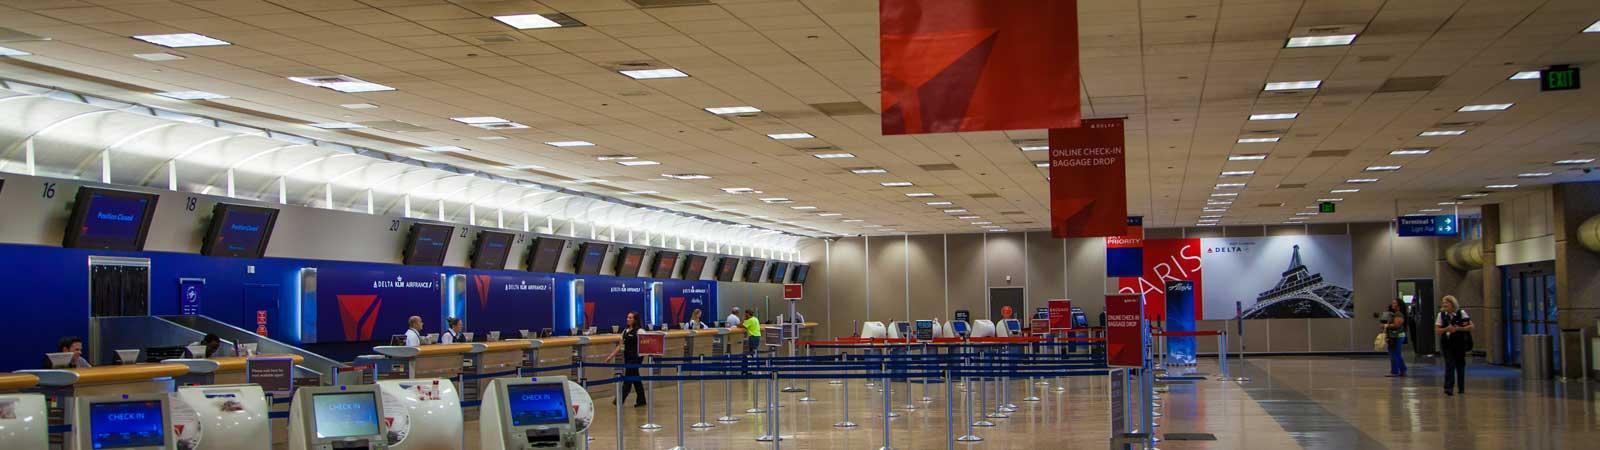 Car Rental Salt Lake City Airport Slc At Low Prices